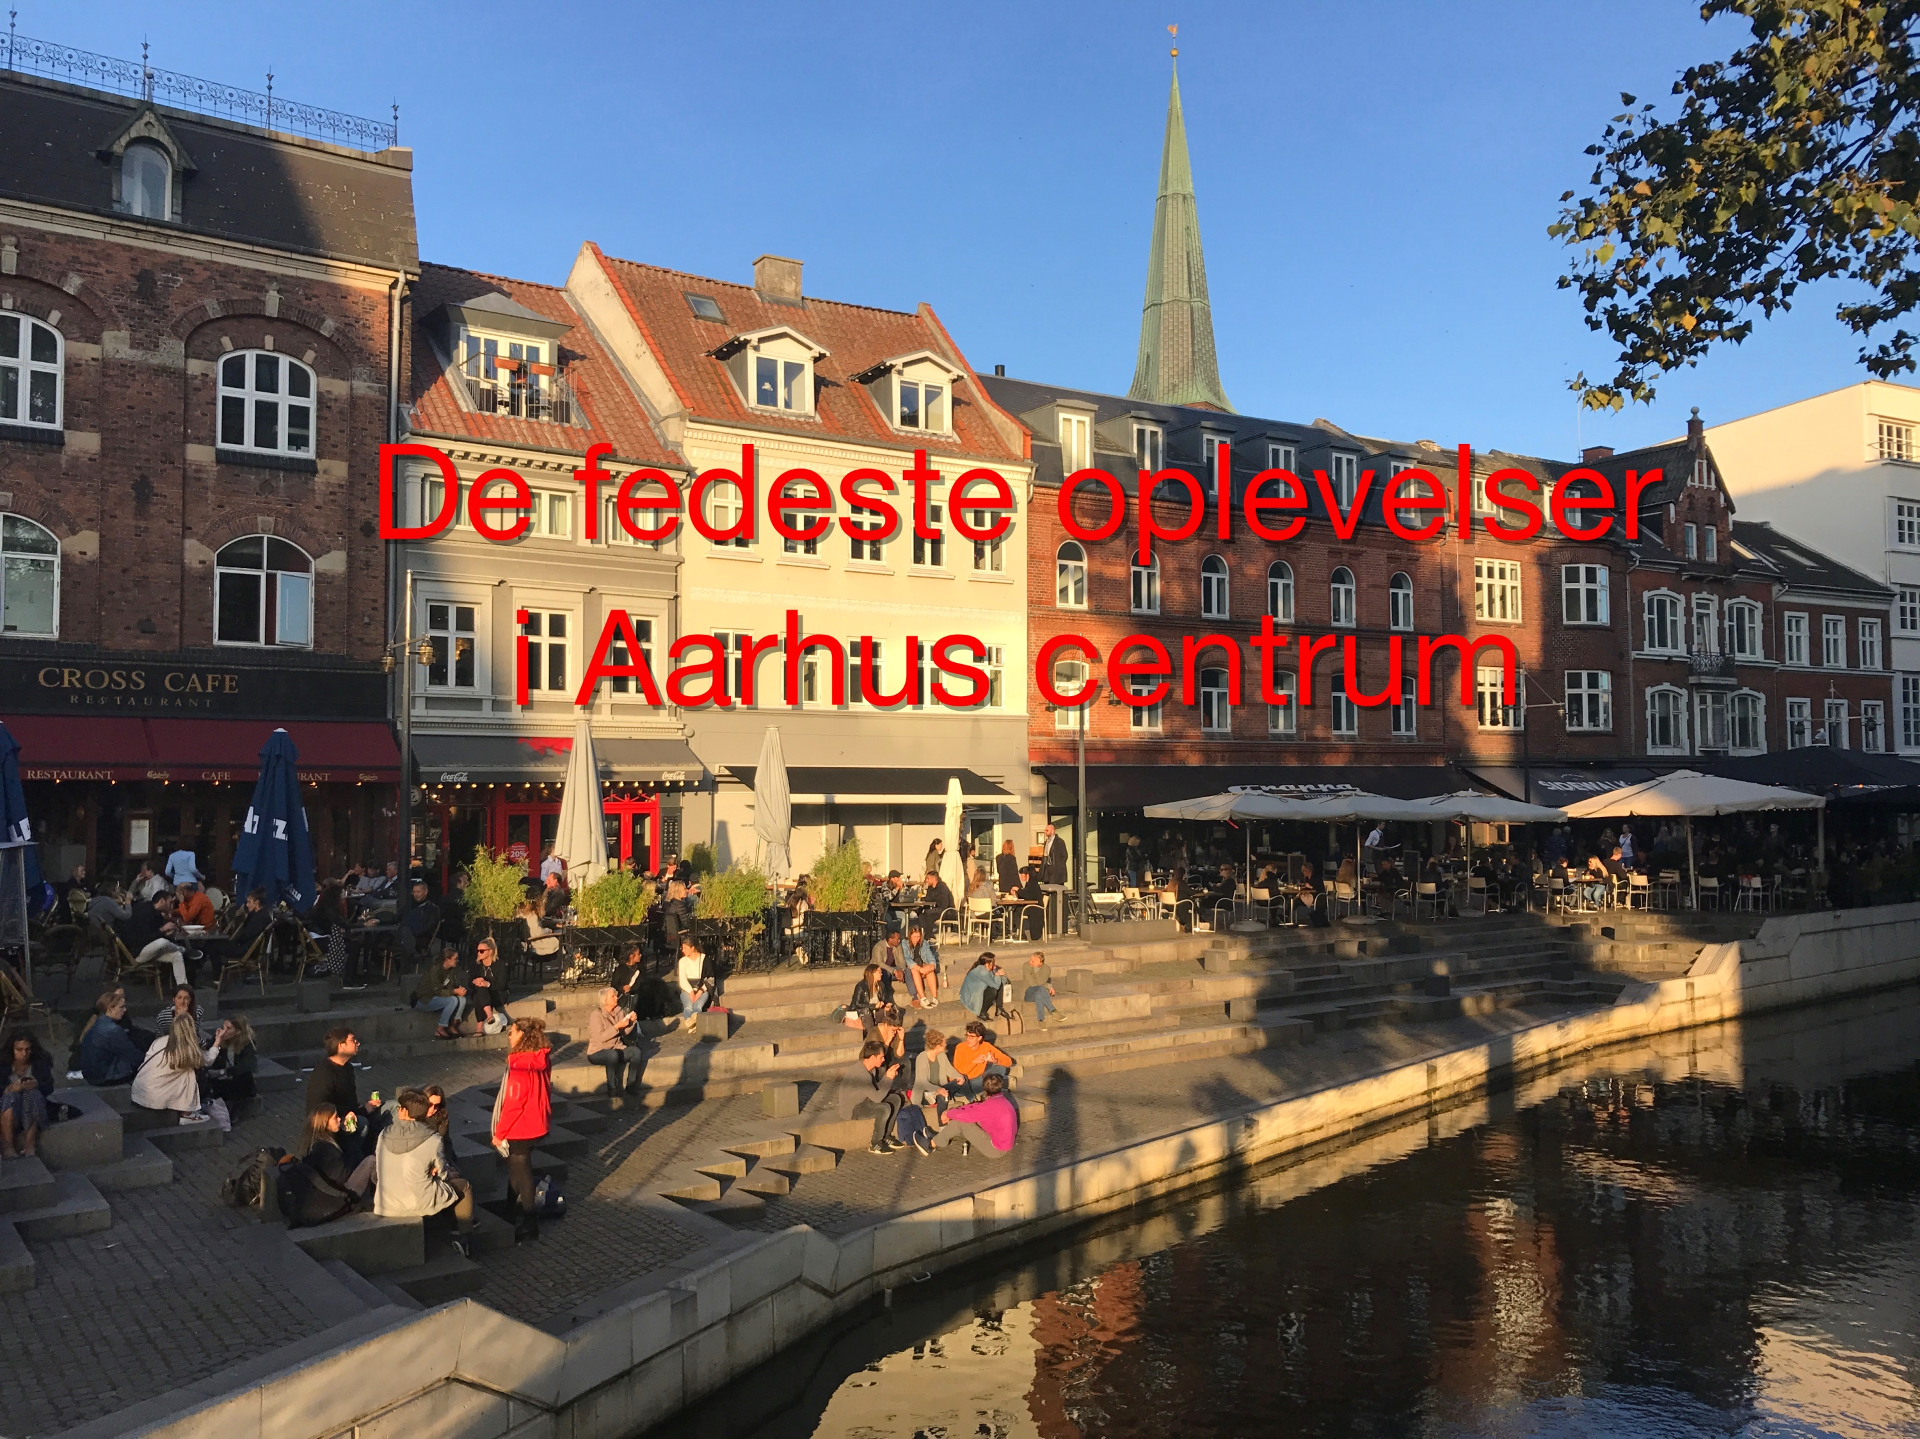 Weekendtur – de fedeste oplevelser i Aarhus